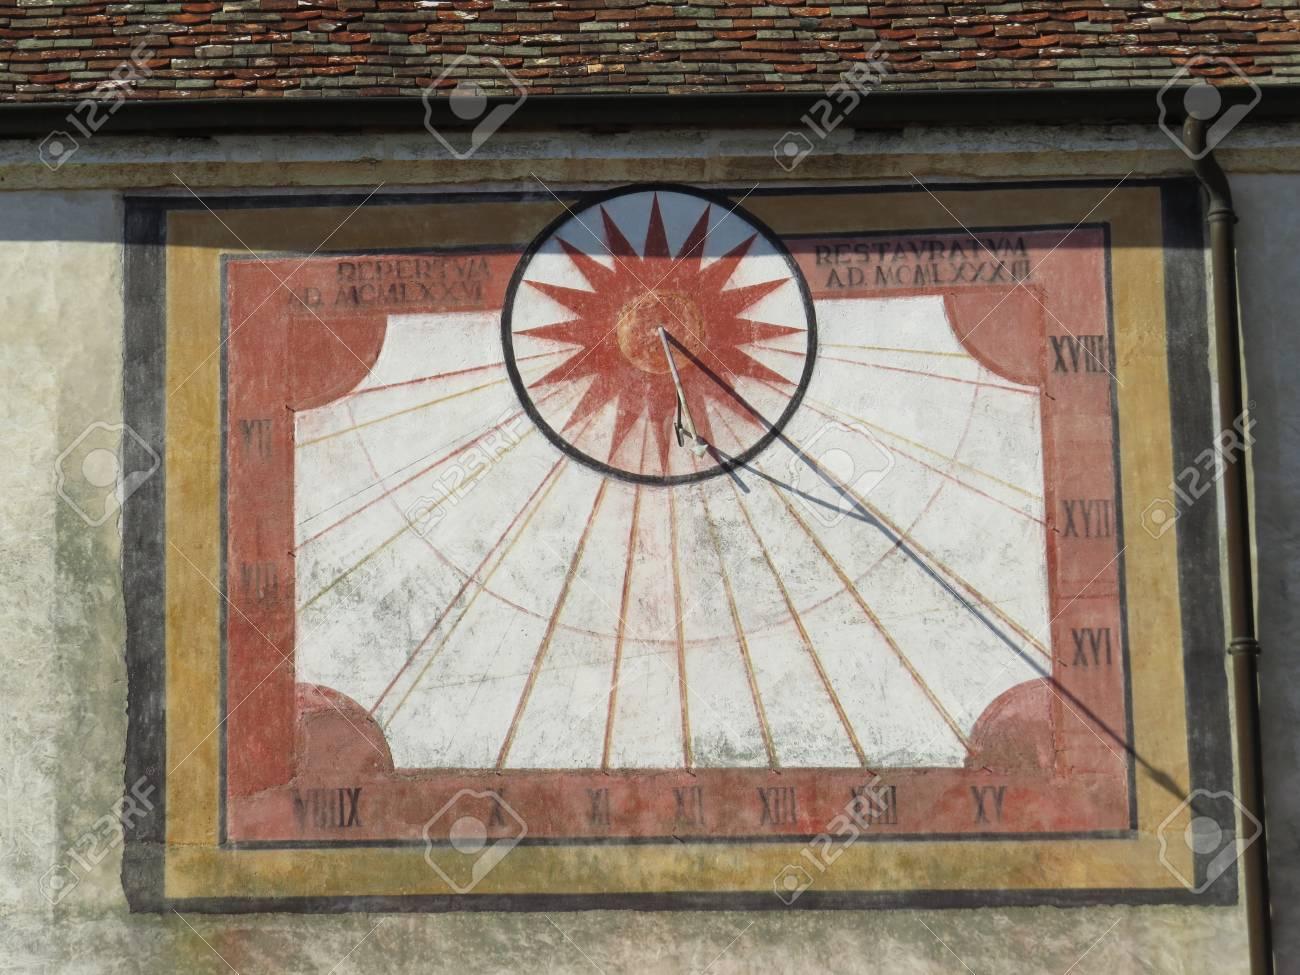 Solar calendar of the Notre-Dame Abbey Ambronay